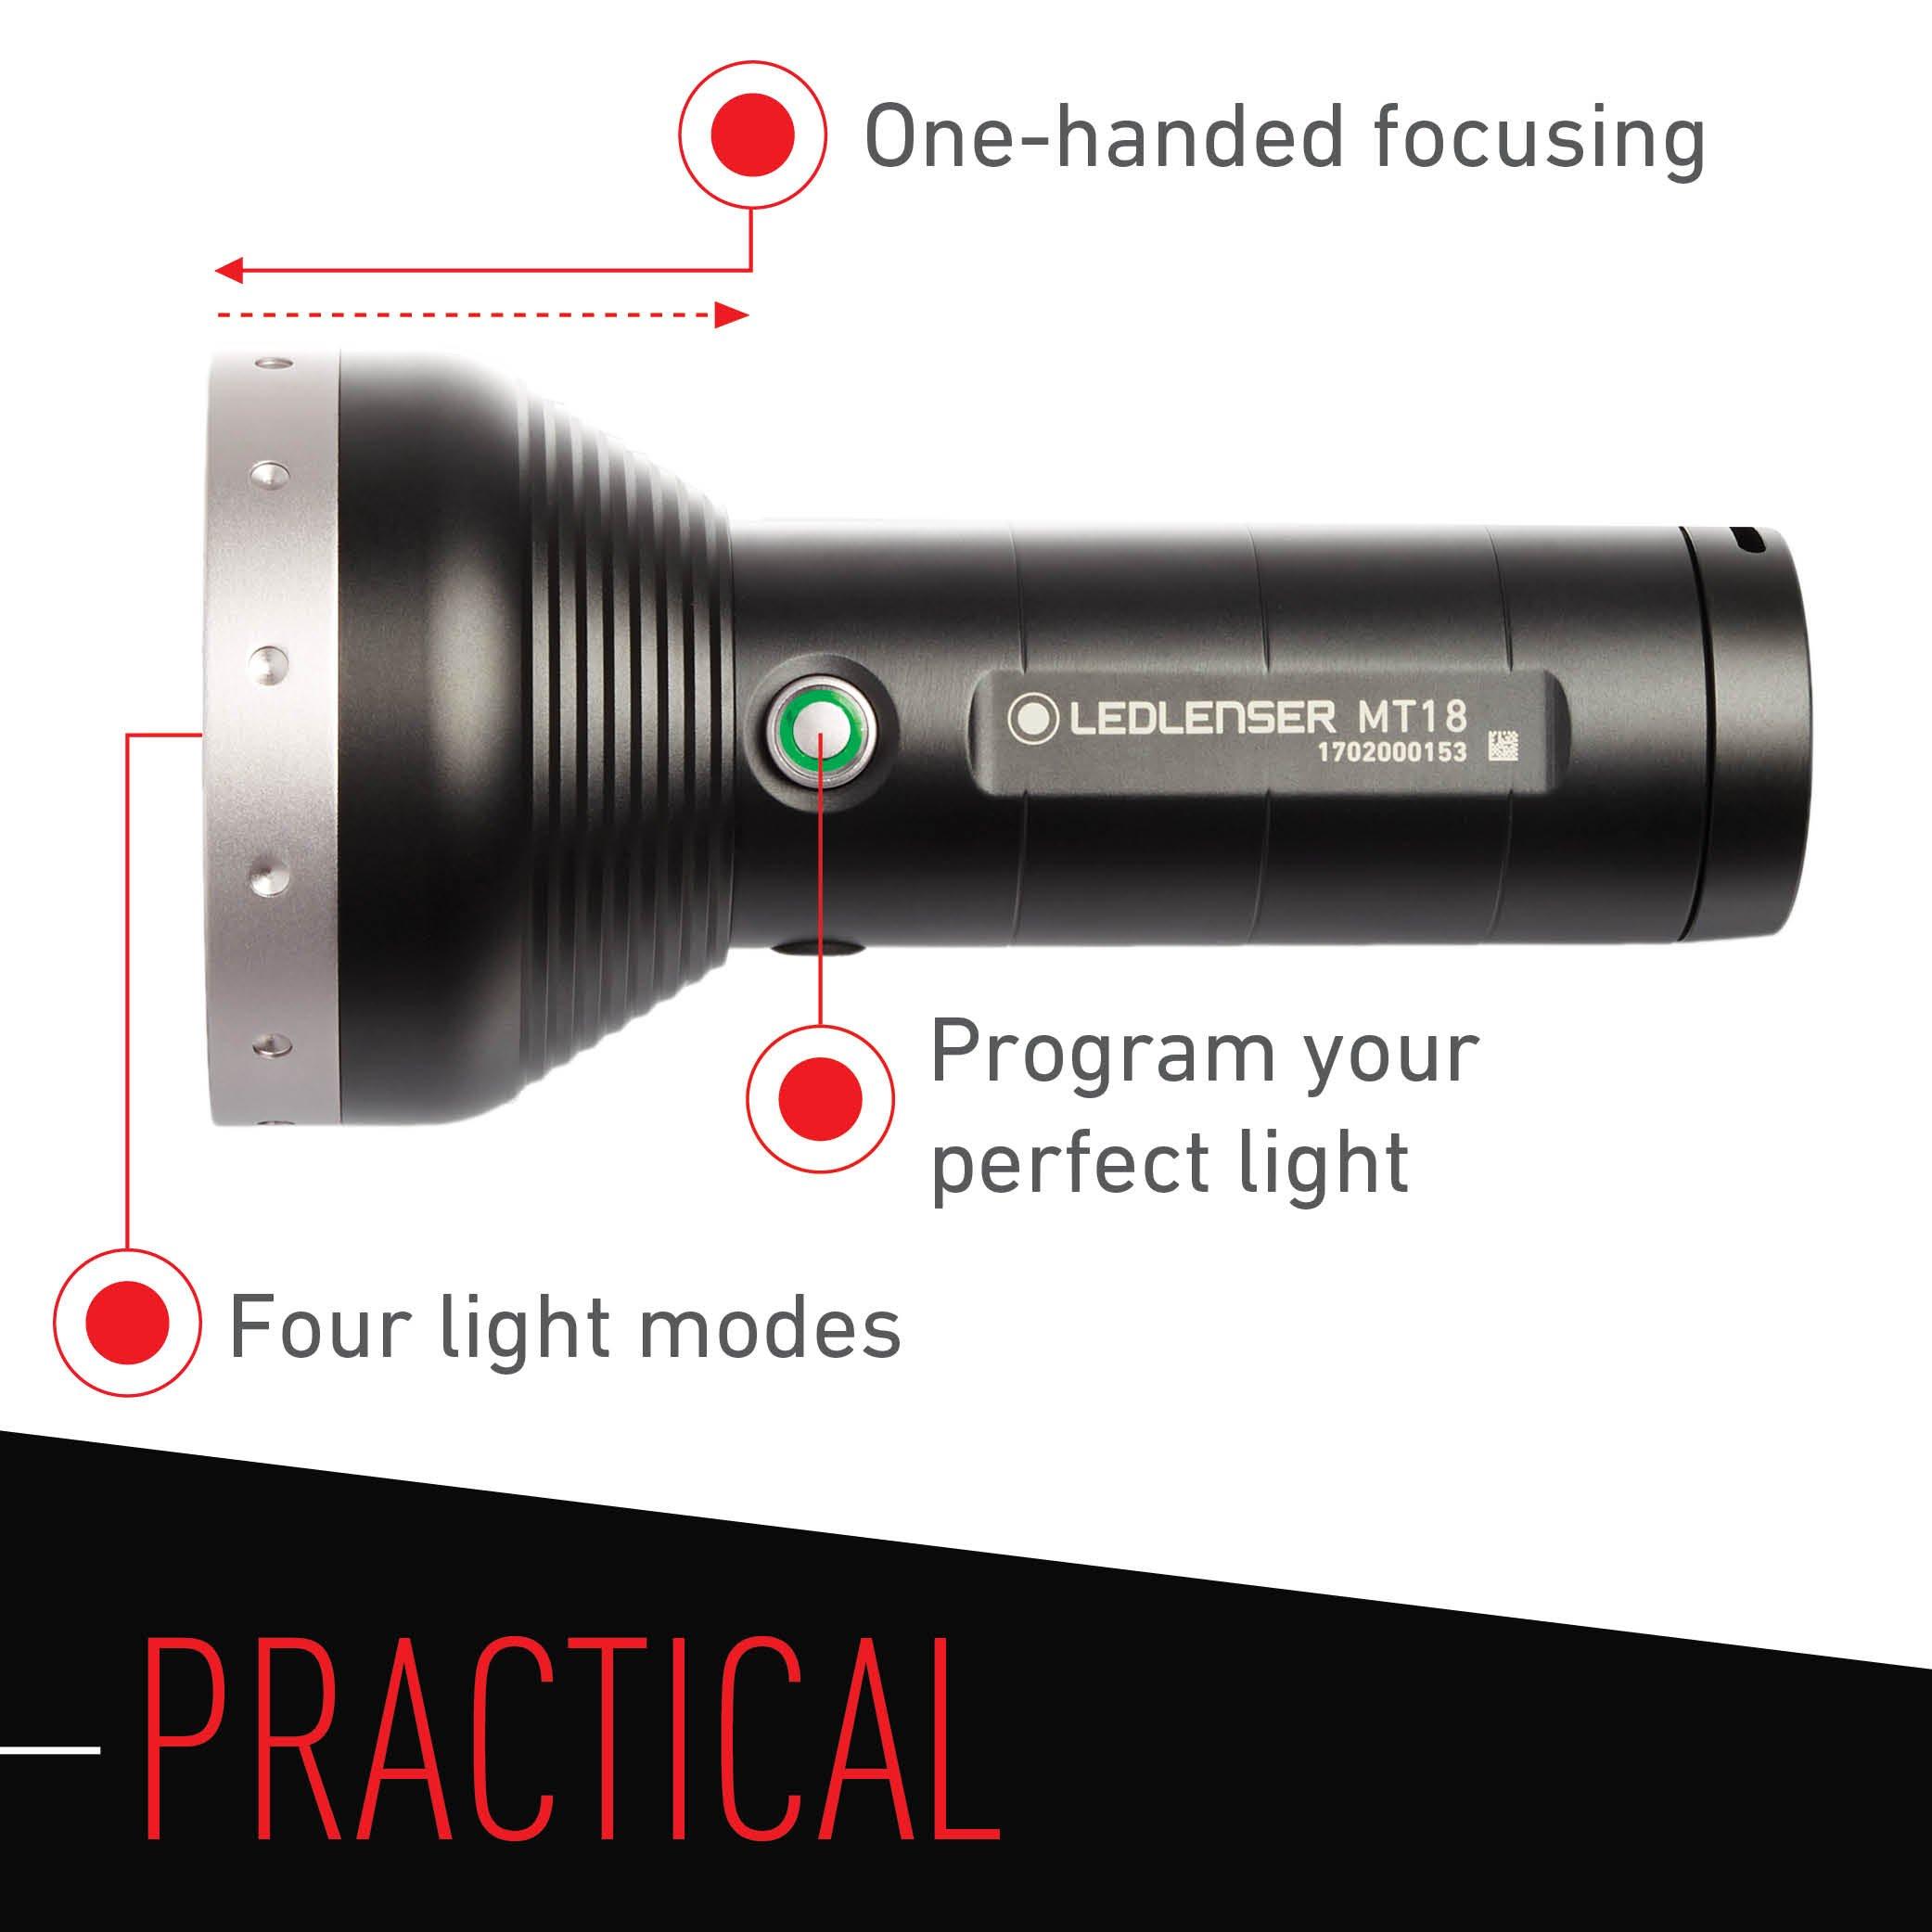 Led Lenser - 3000 Lumens, MT18 Flashlight with Rapid Focus System by LED Lenser (Image #4)